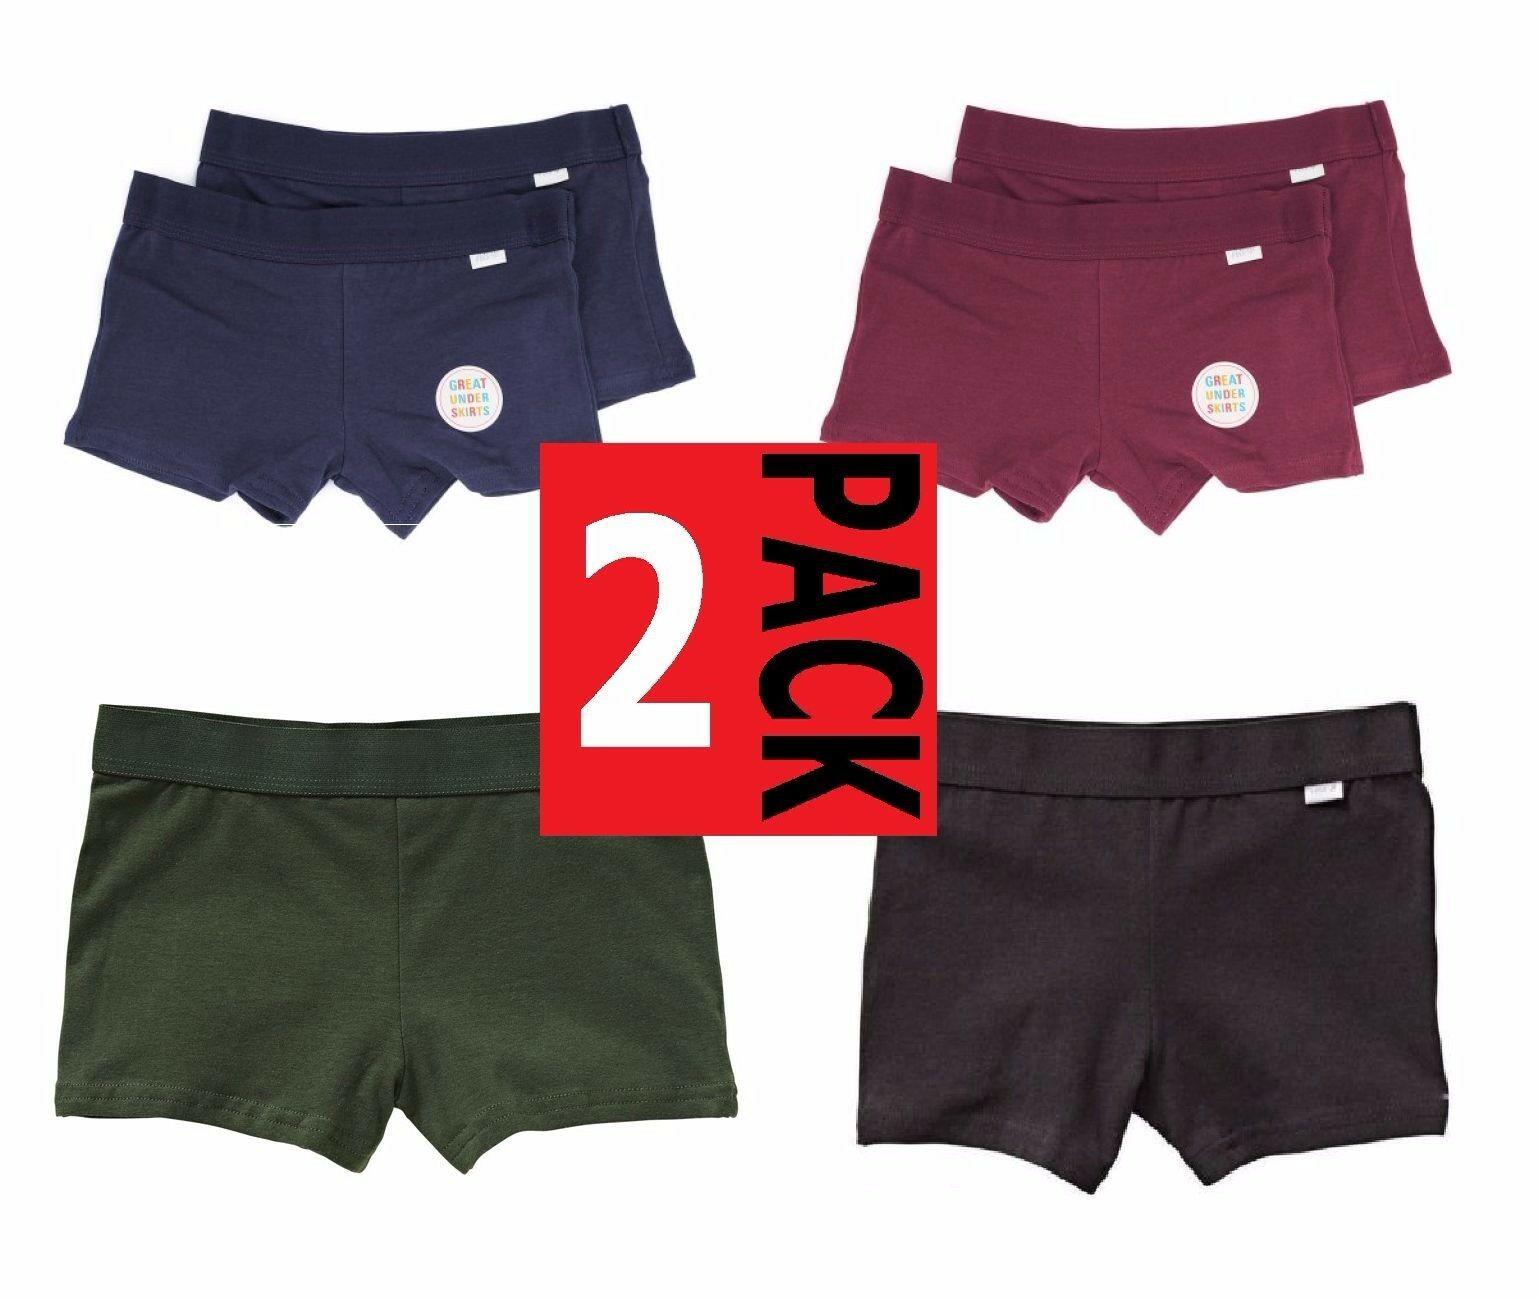 Rio 2 Pack Girls Netball Knickers Shorts Underwear School Black Navy Size 4 -16